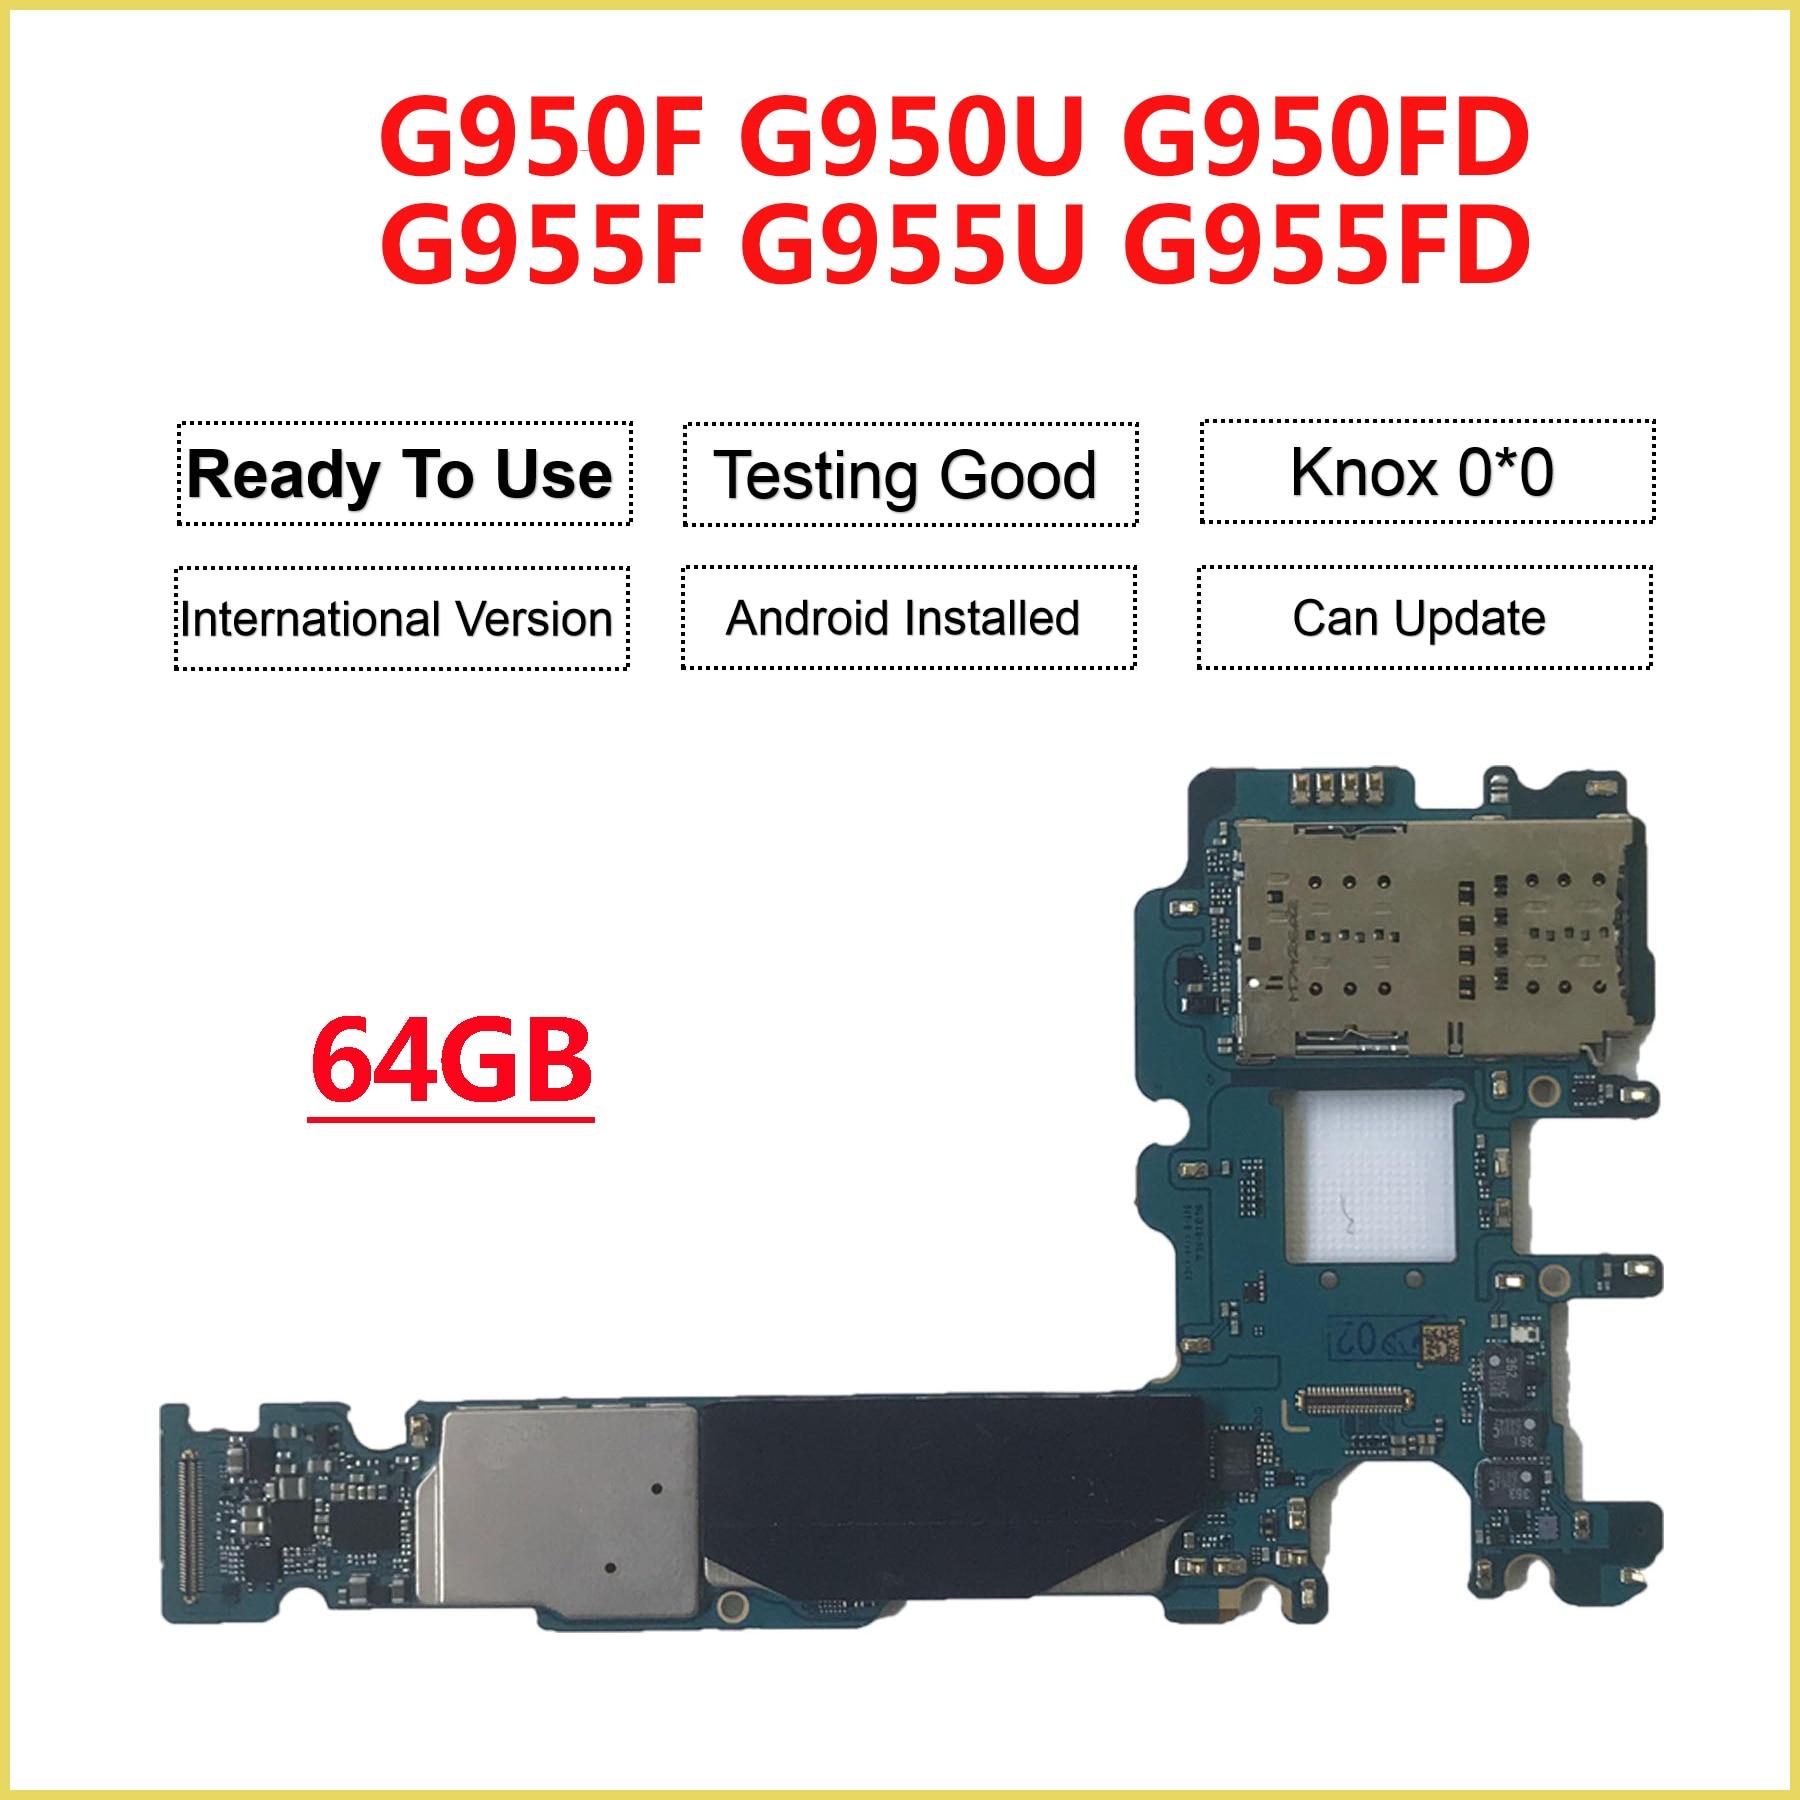 Reemplazo de la placa base principal desbloqueada de 64GB para Samsung Galaxy S8 + Plus G955F G955FD G950FD S8 G950F G950FD G950U